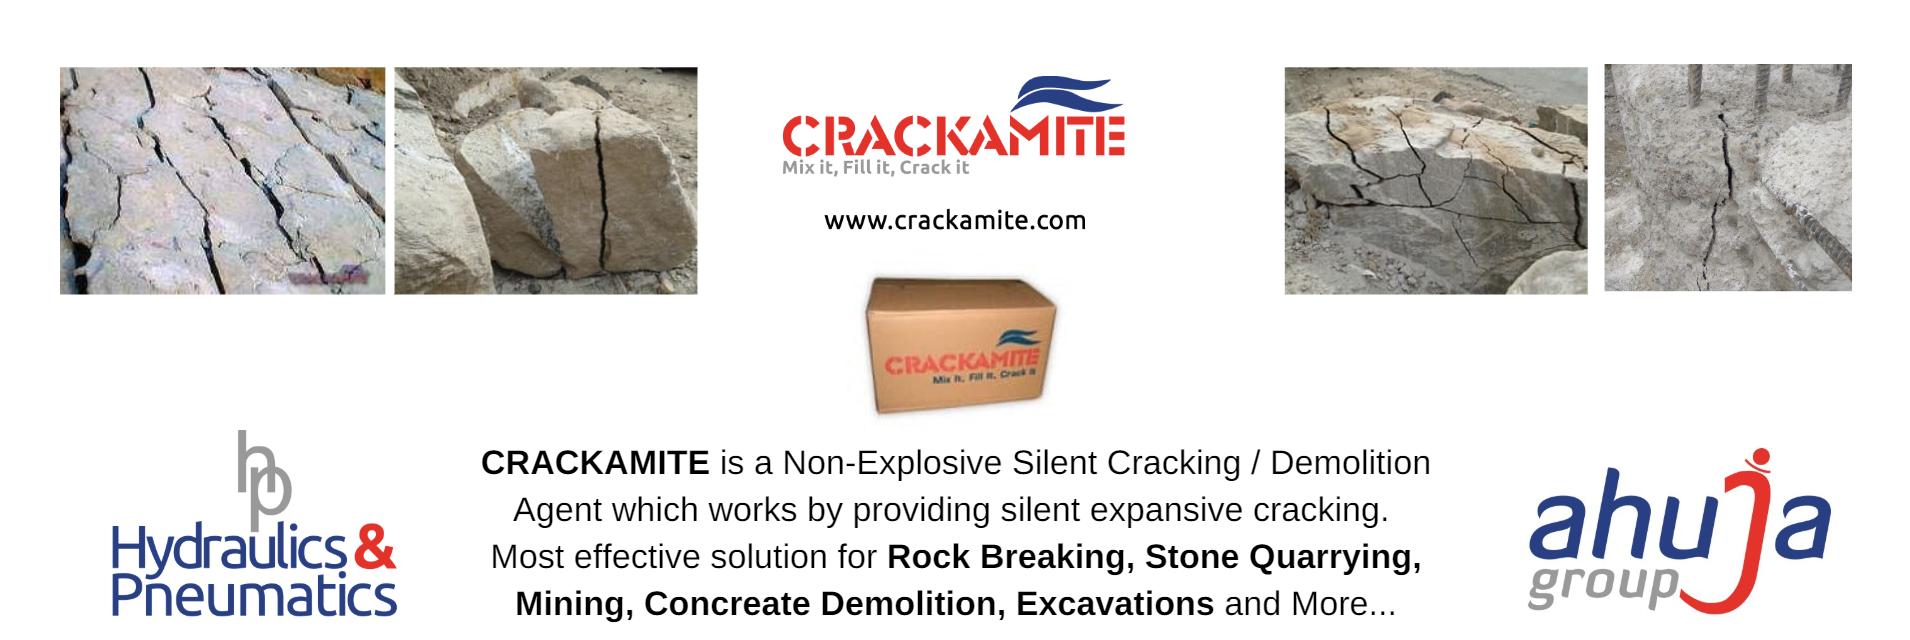 Crackamite